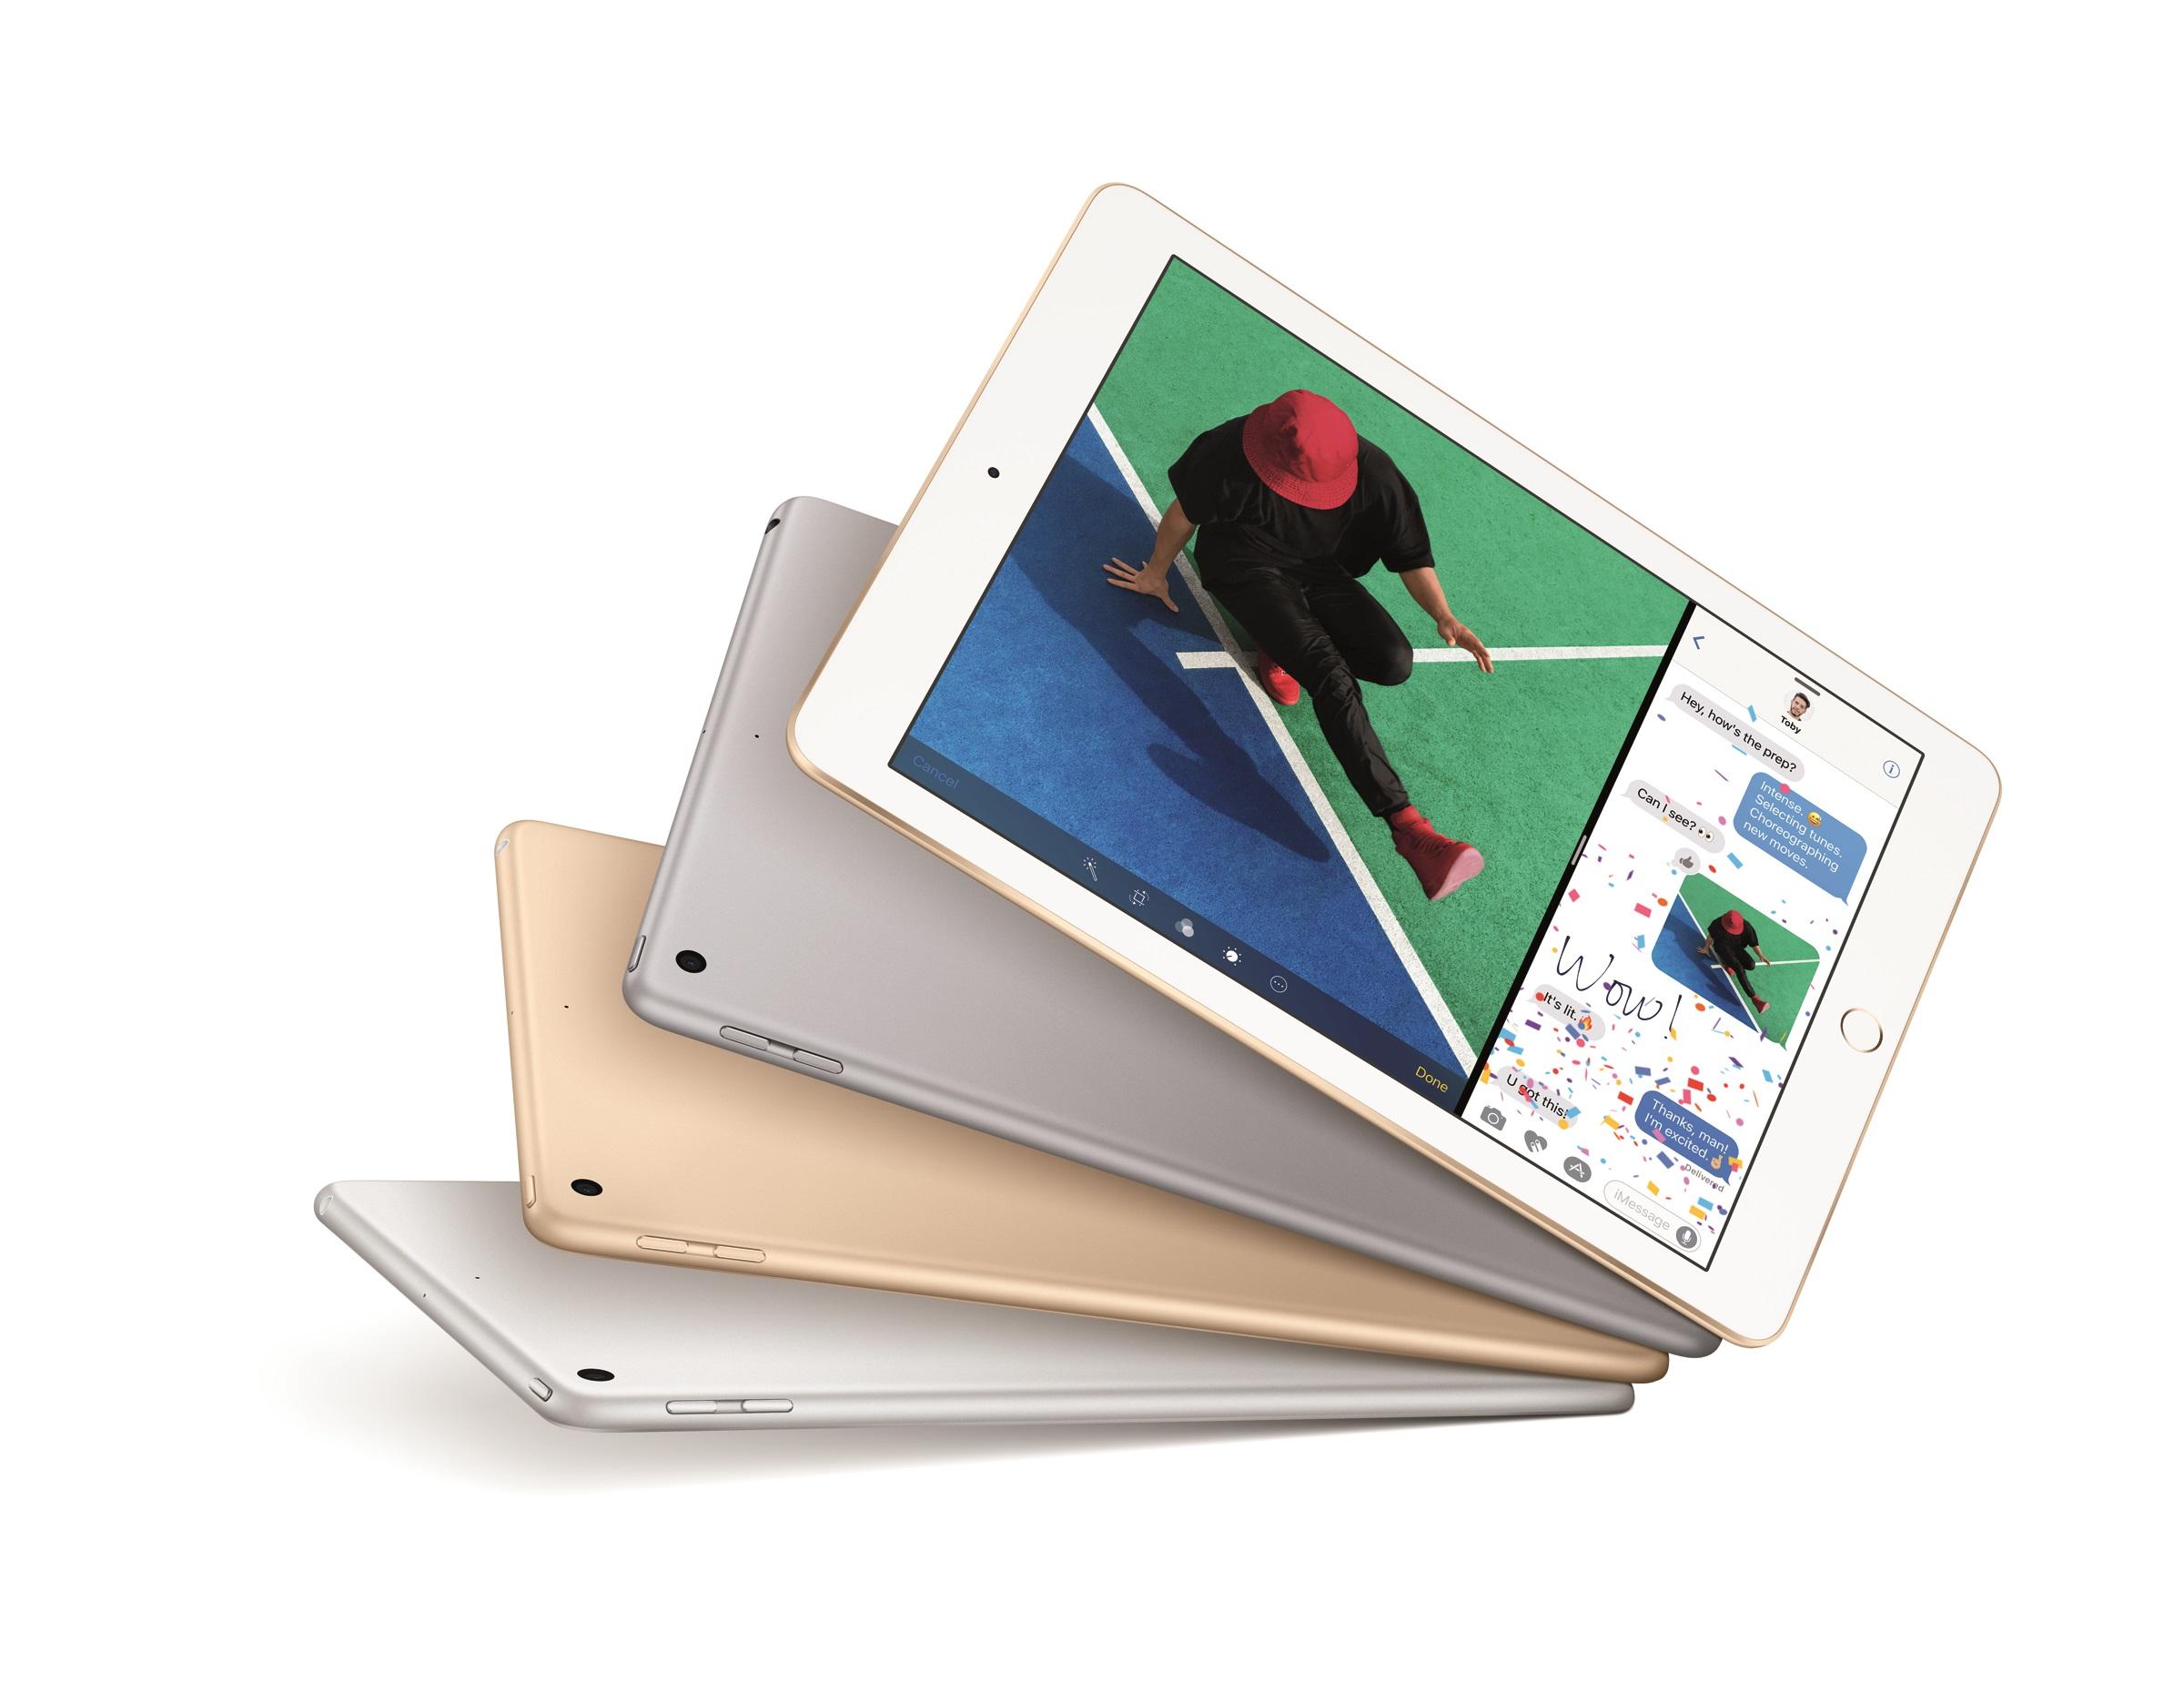 Apple's iPad lineup.